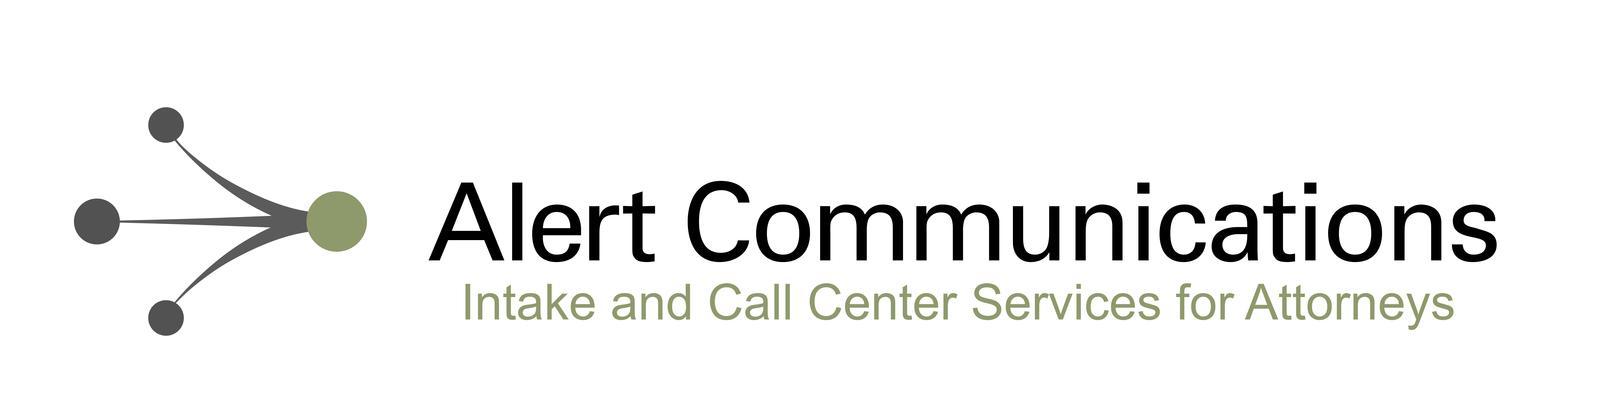 Smith.ai vs. Alert Communications: Live Answering Service Comparison